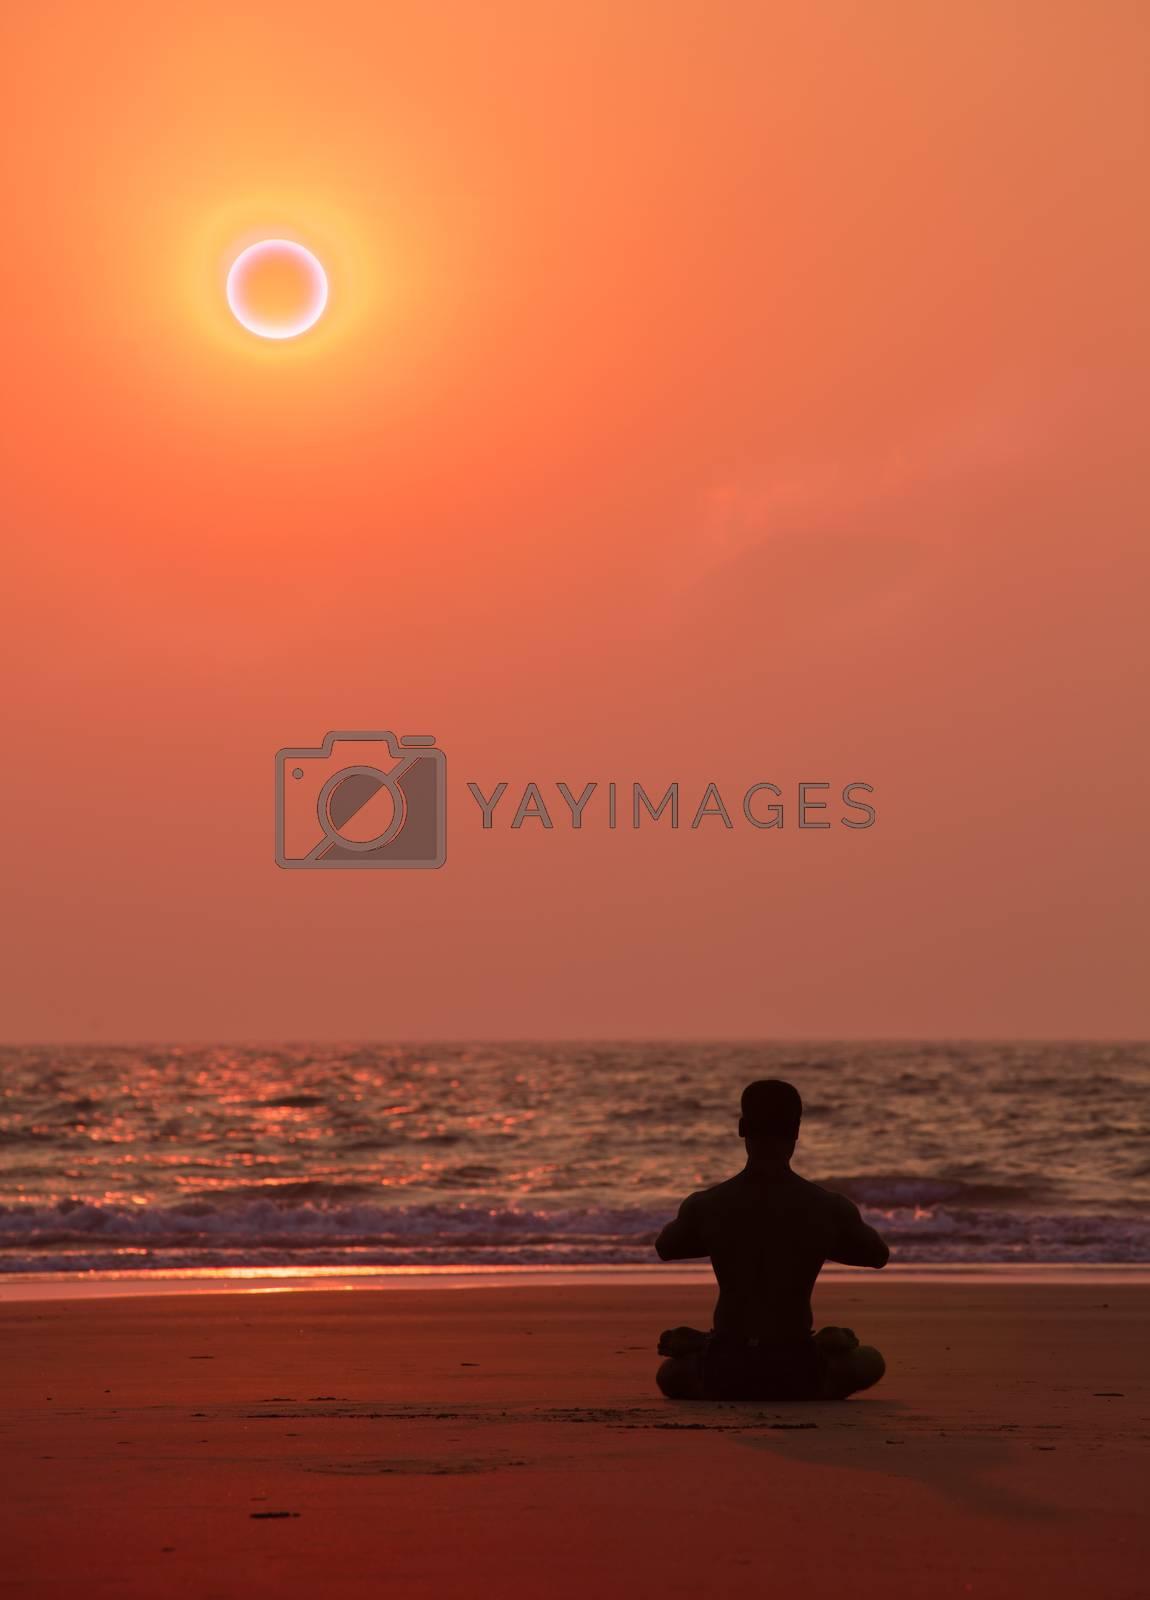 Yoga on the beach in India  Sitting asana